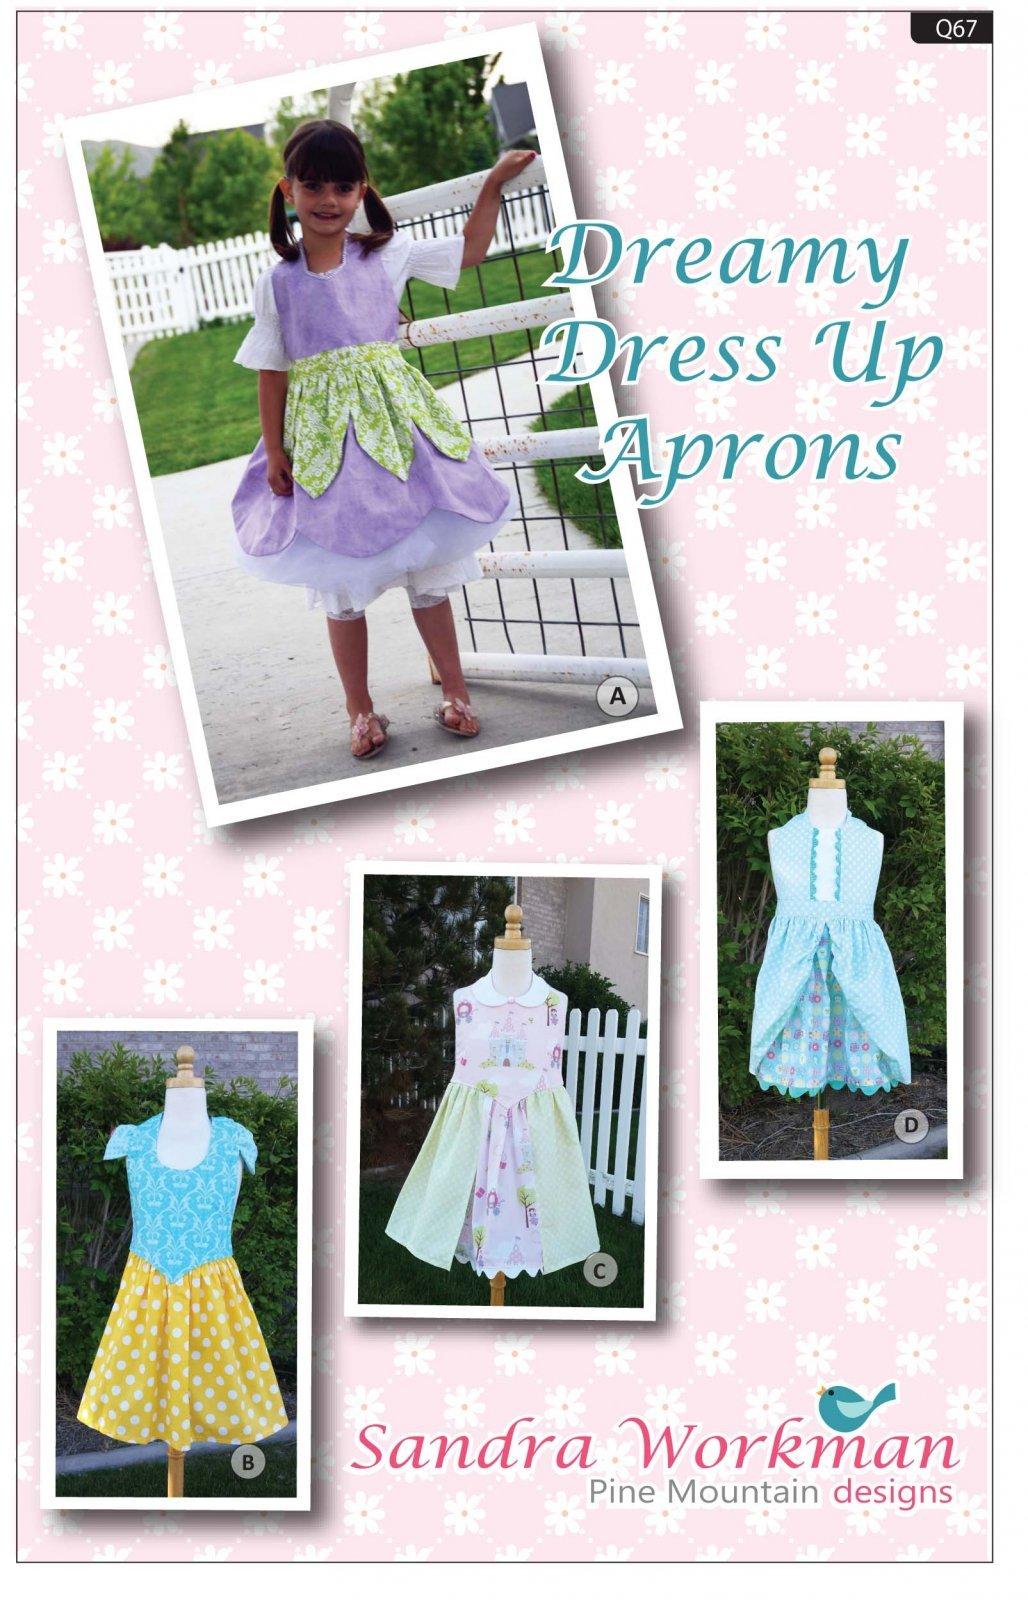 Dreamy Dress Up Aprons